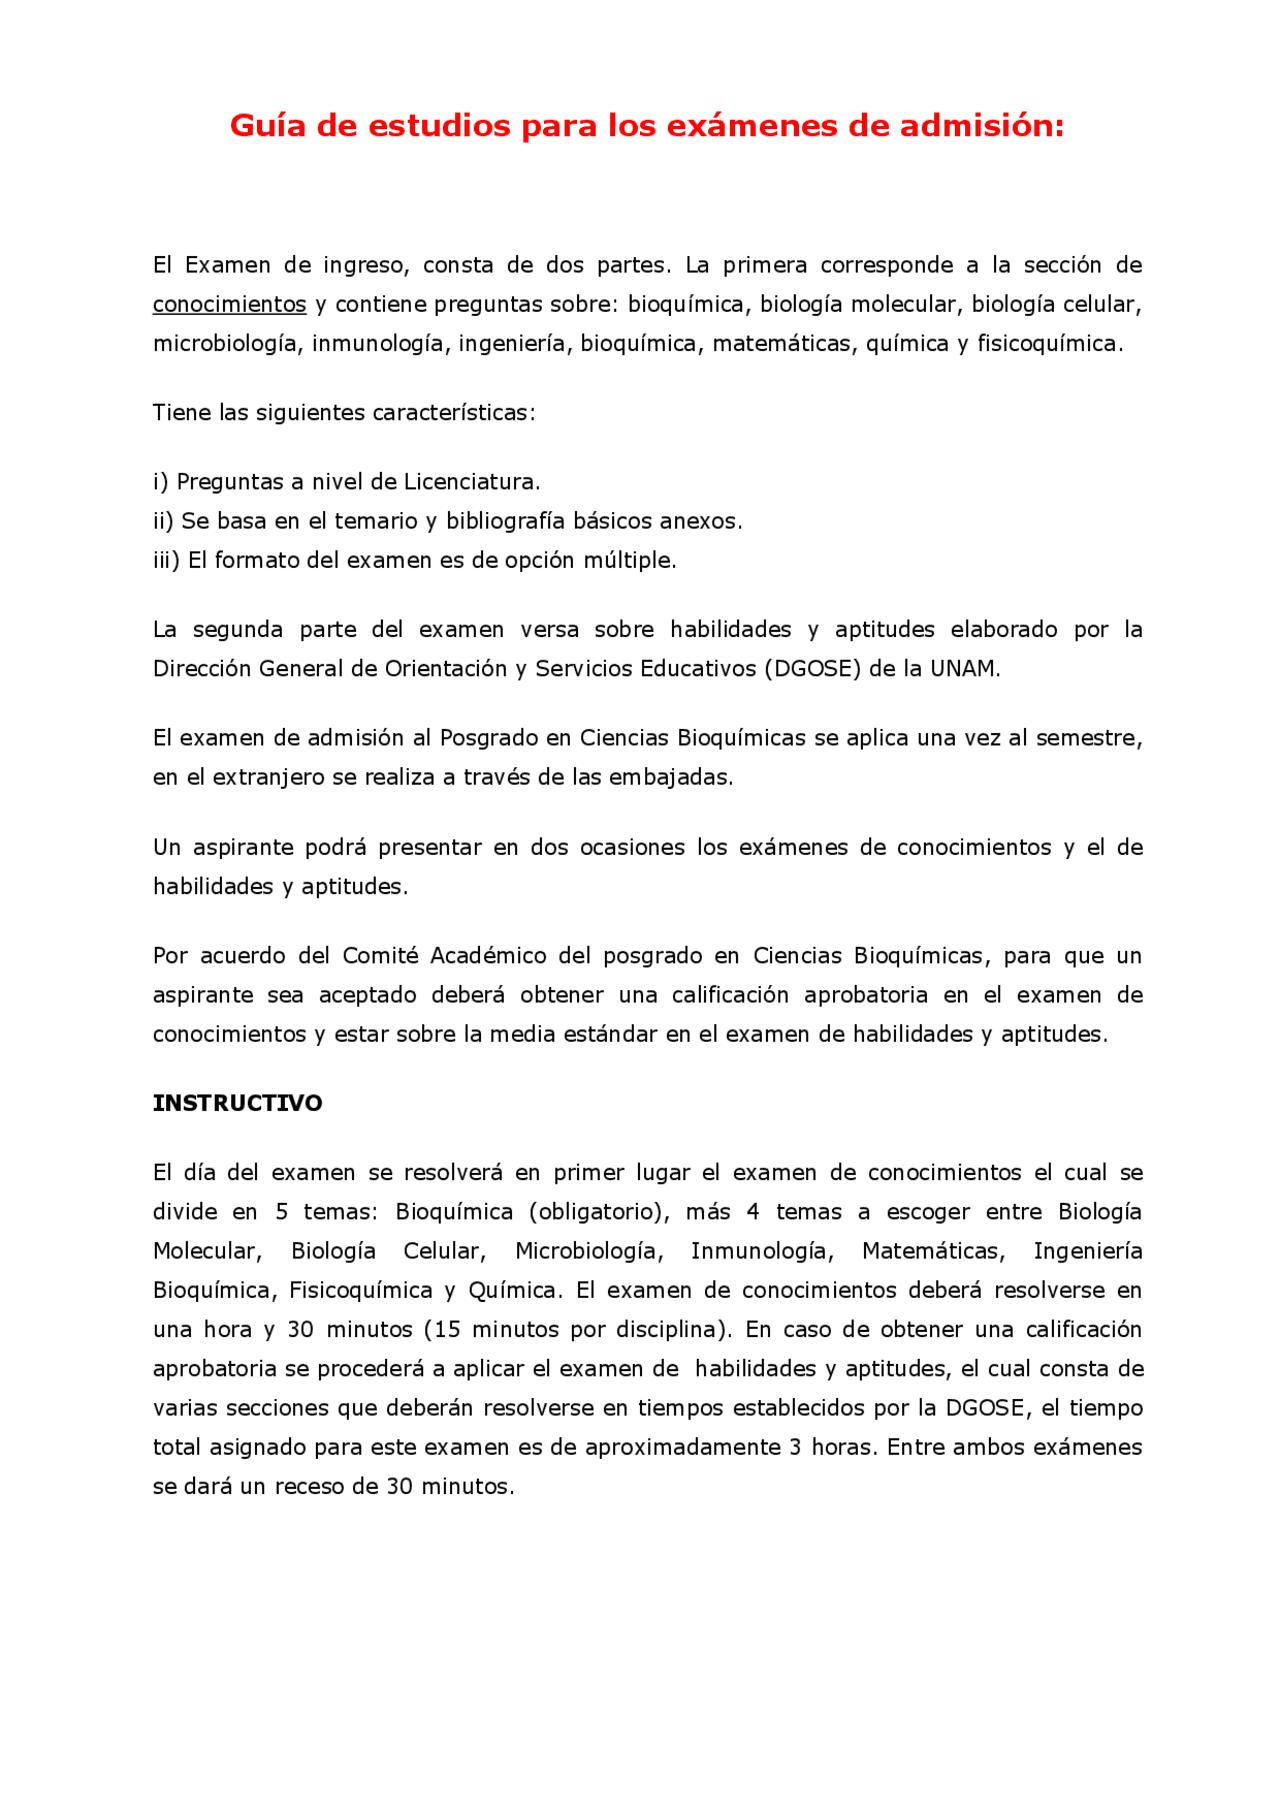 Examenes De Bioquimica Guia Docsity